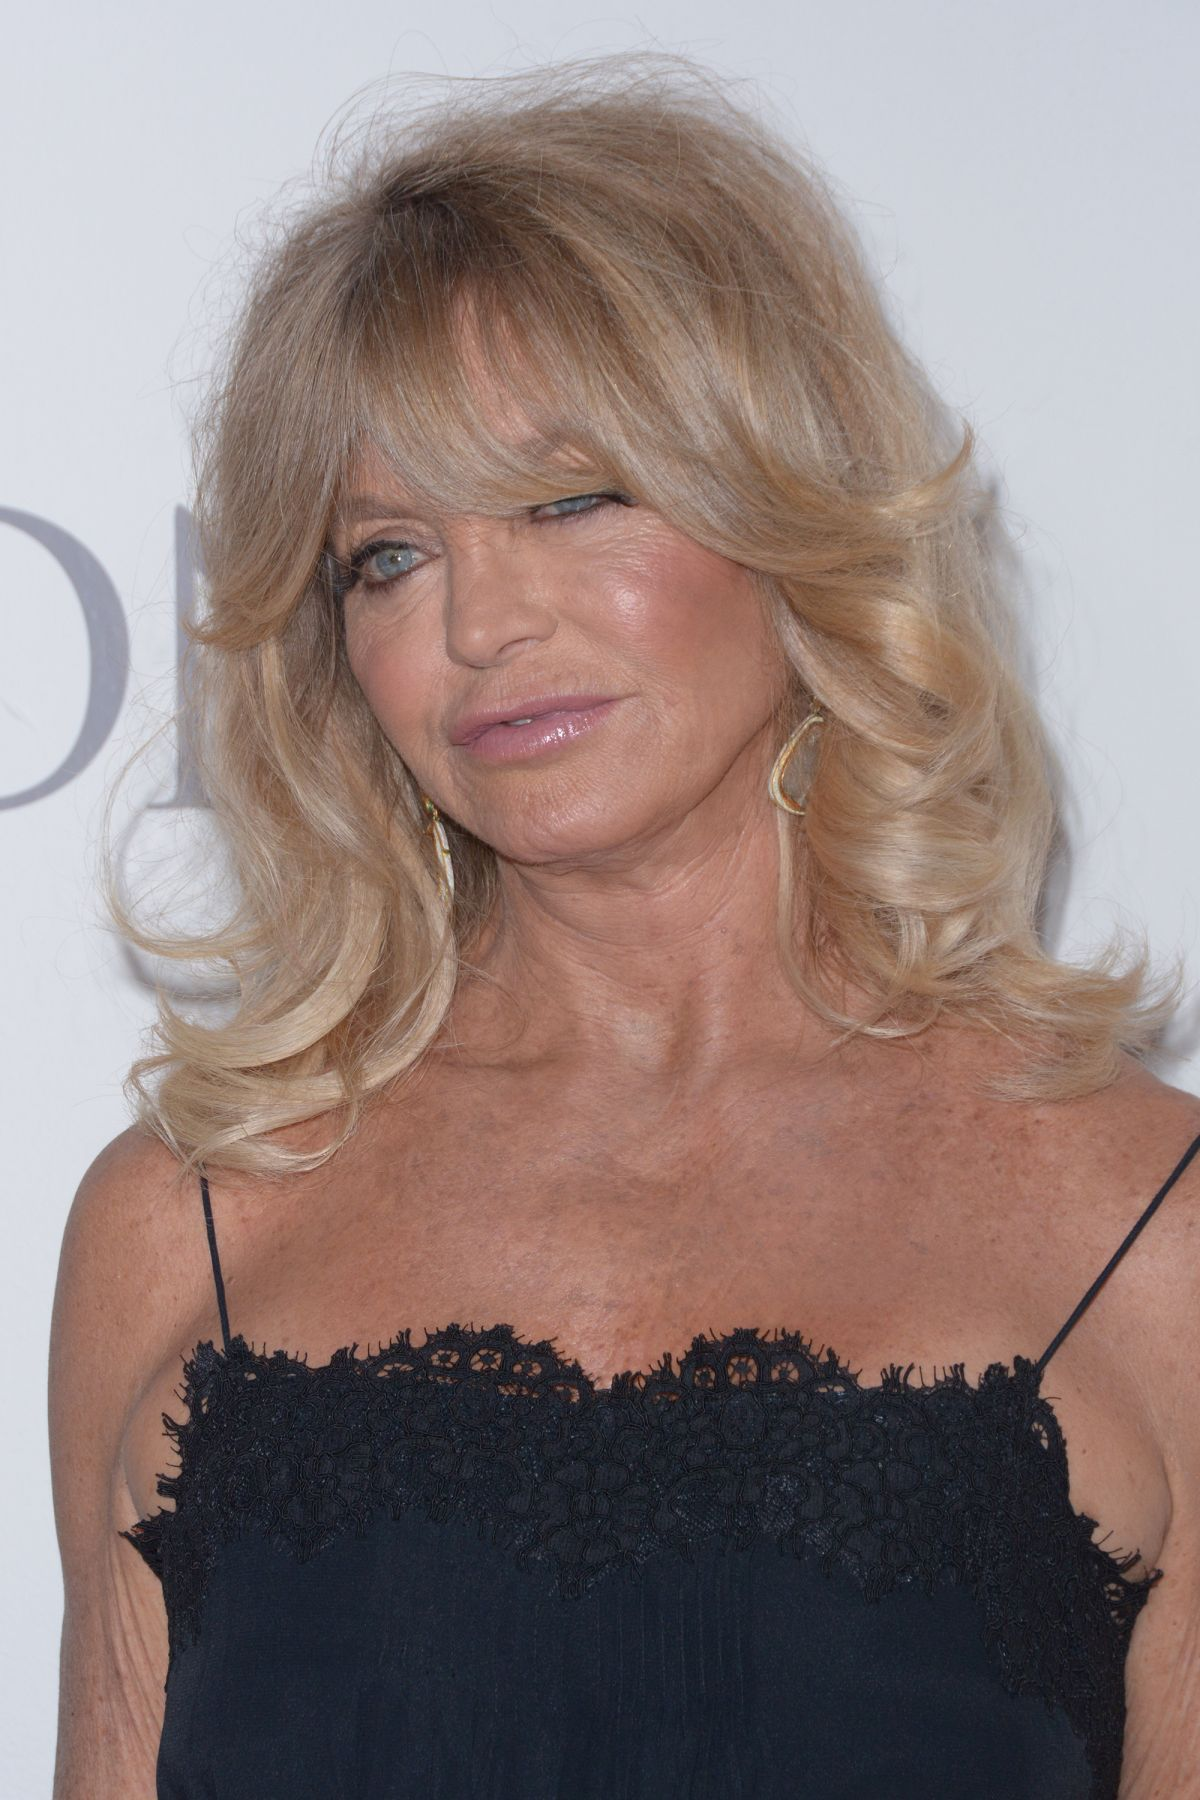 Image Result For Goldie Hawn Haircut 2017 Goldie Hawn Hair